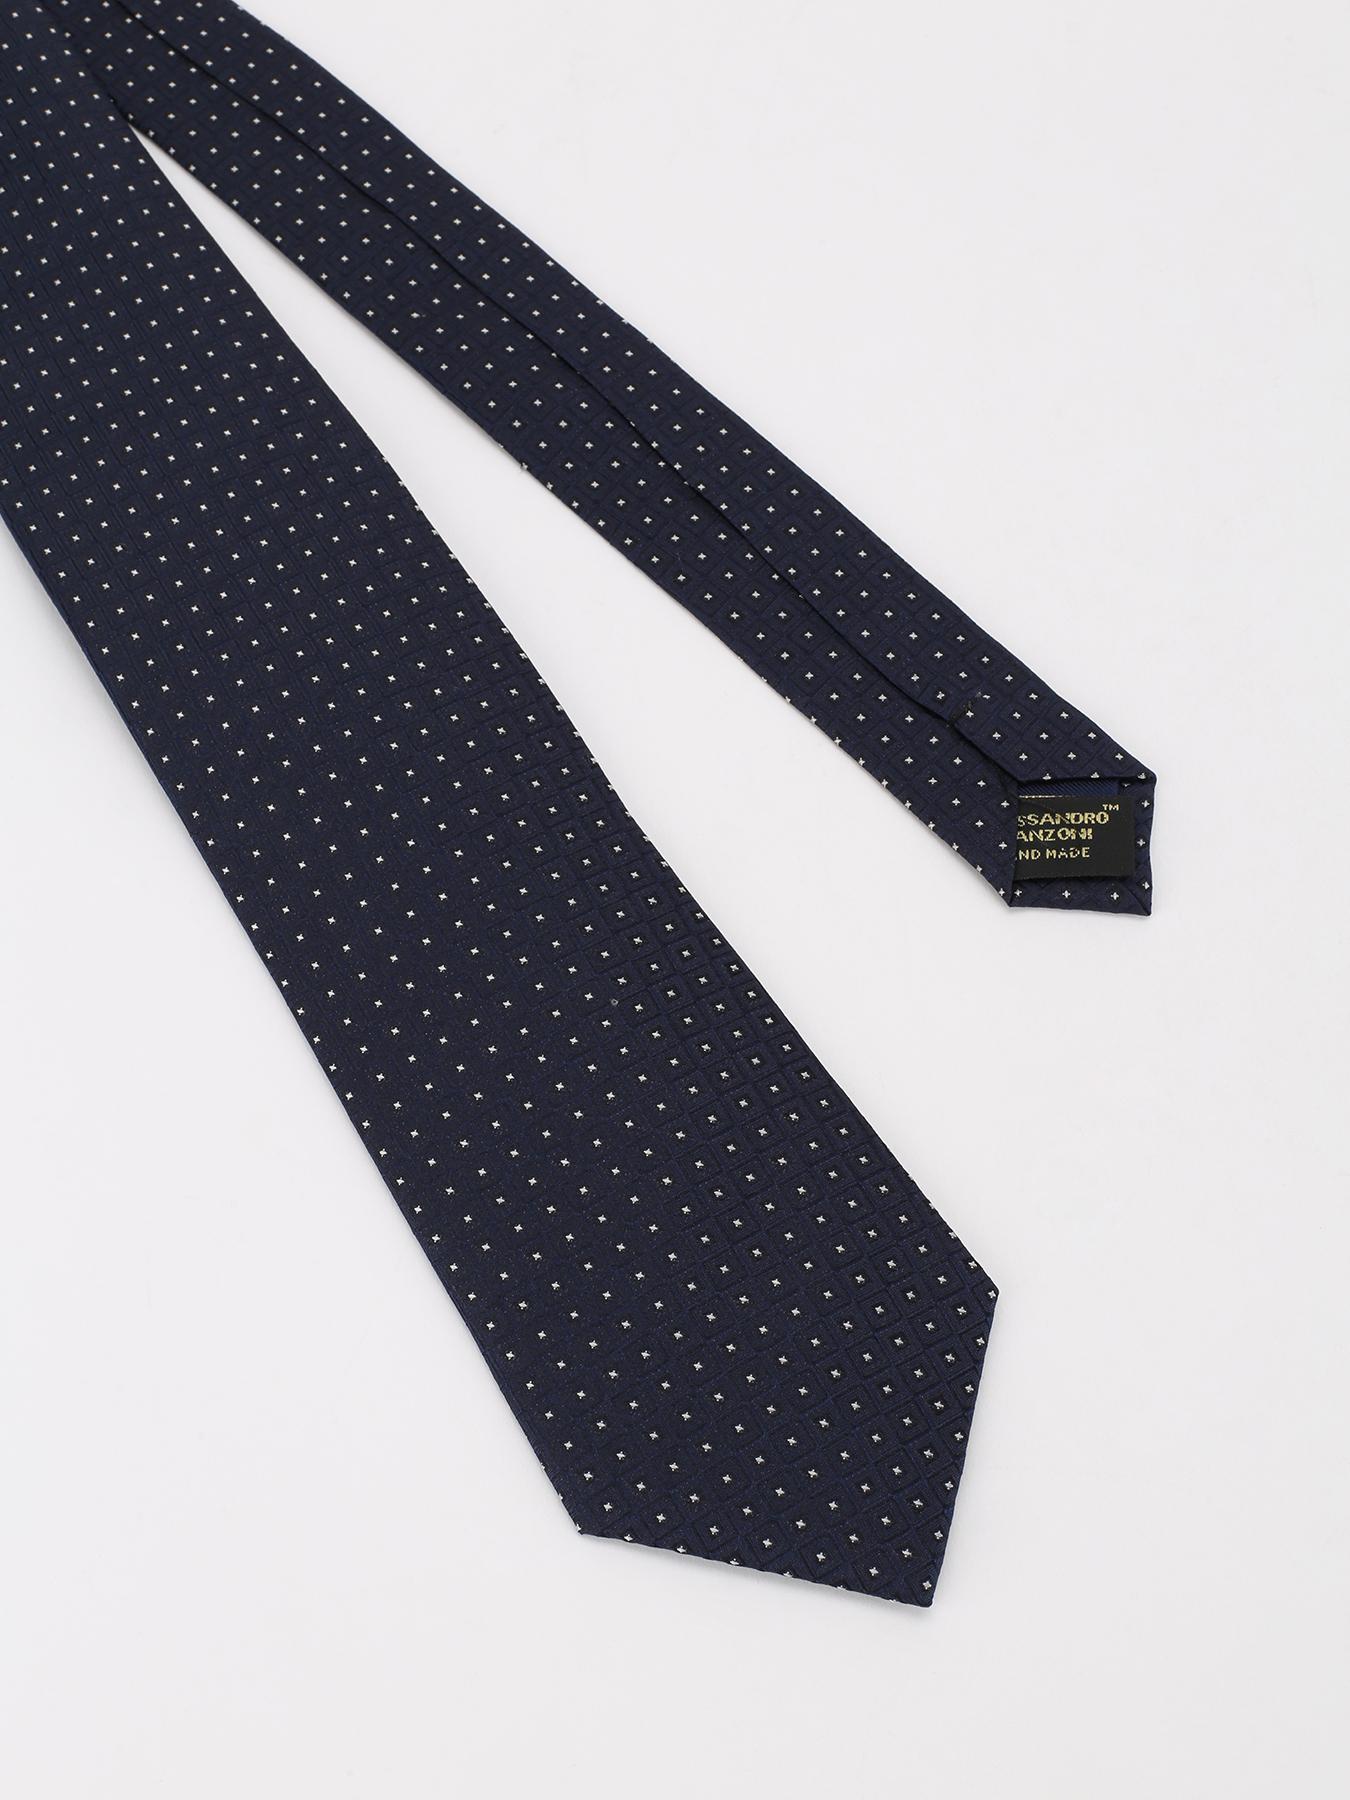 Alessandro Manzoni Шелковый галстук с узорами 324190-185 Фото 3